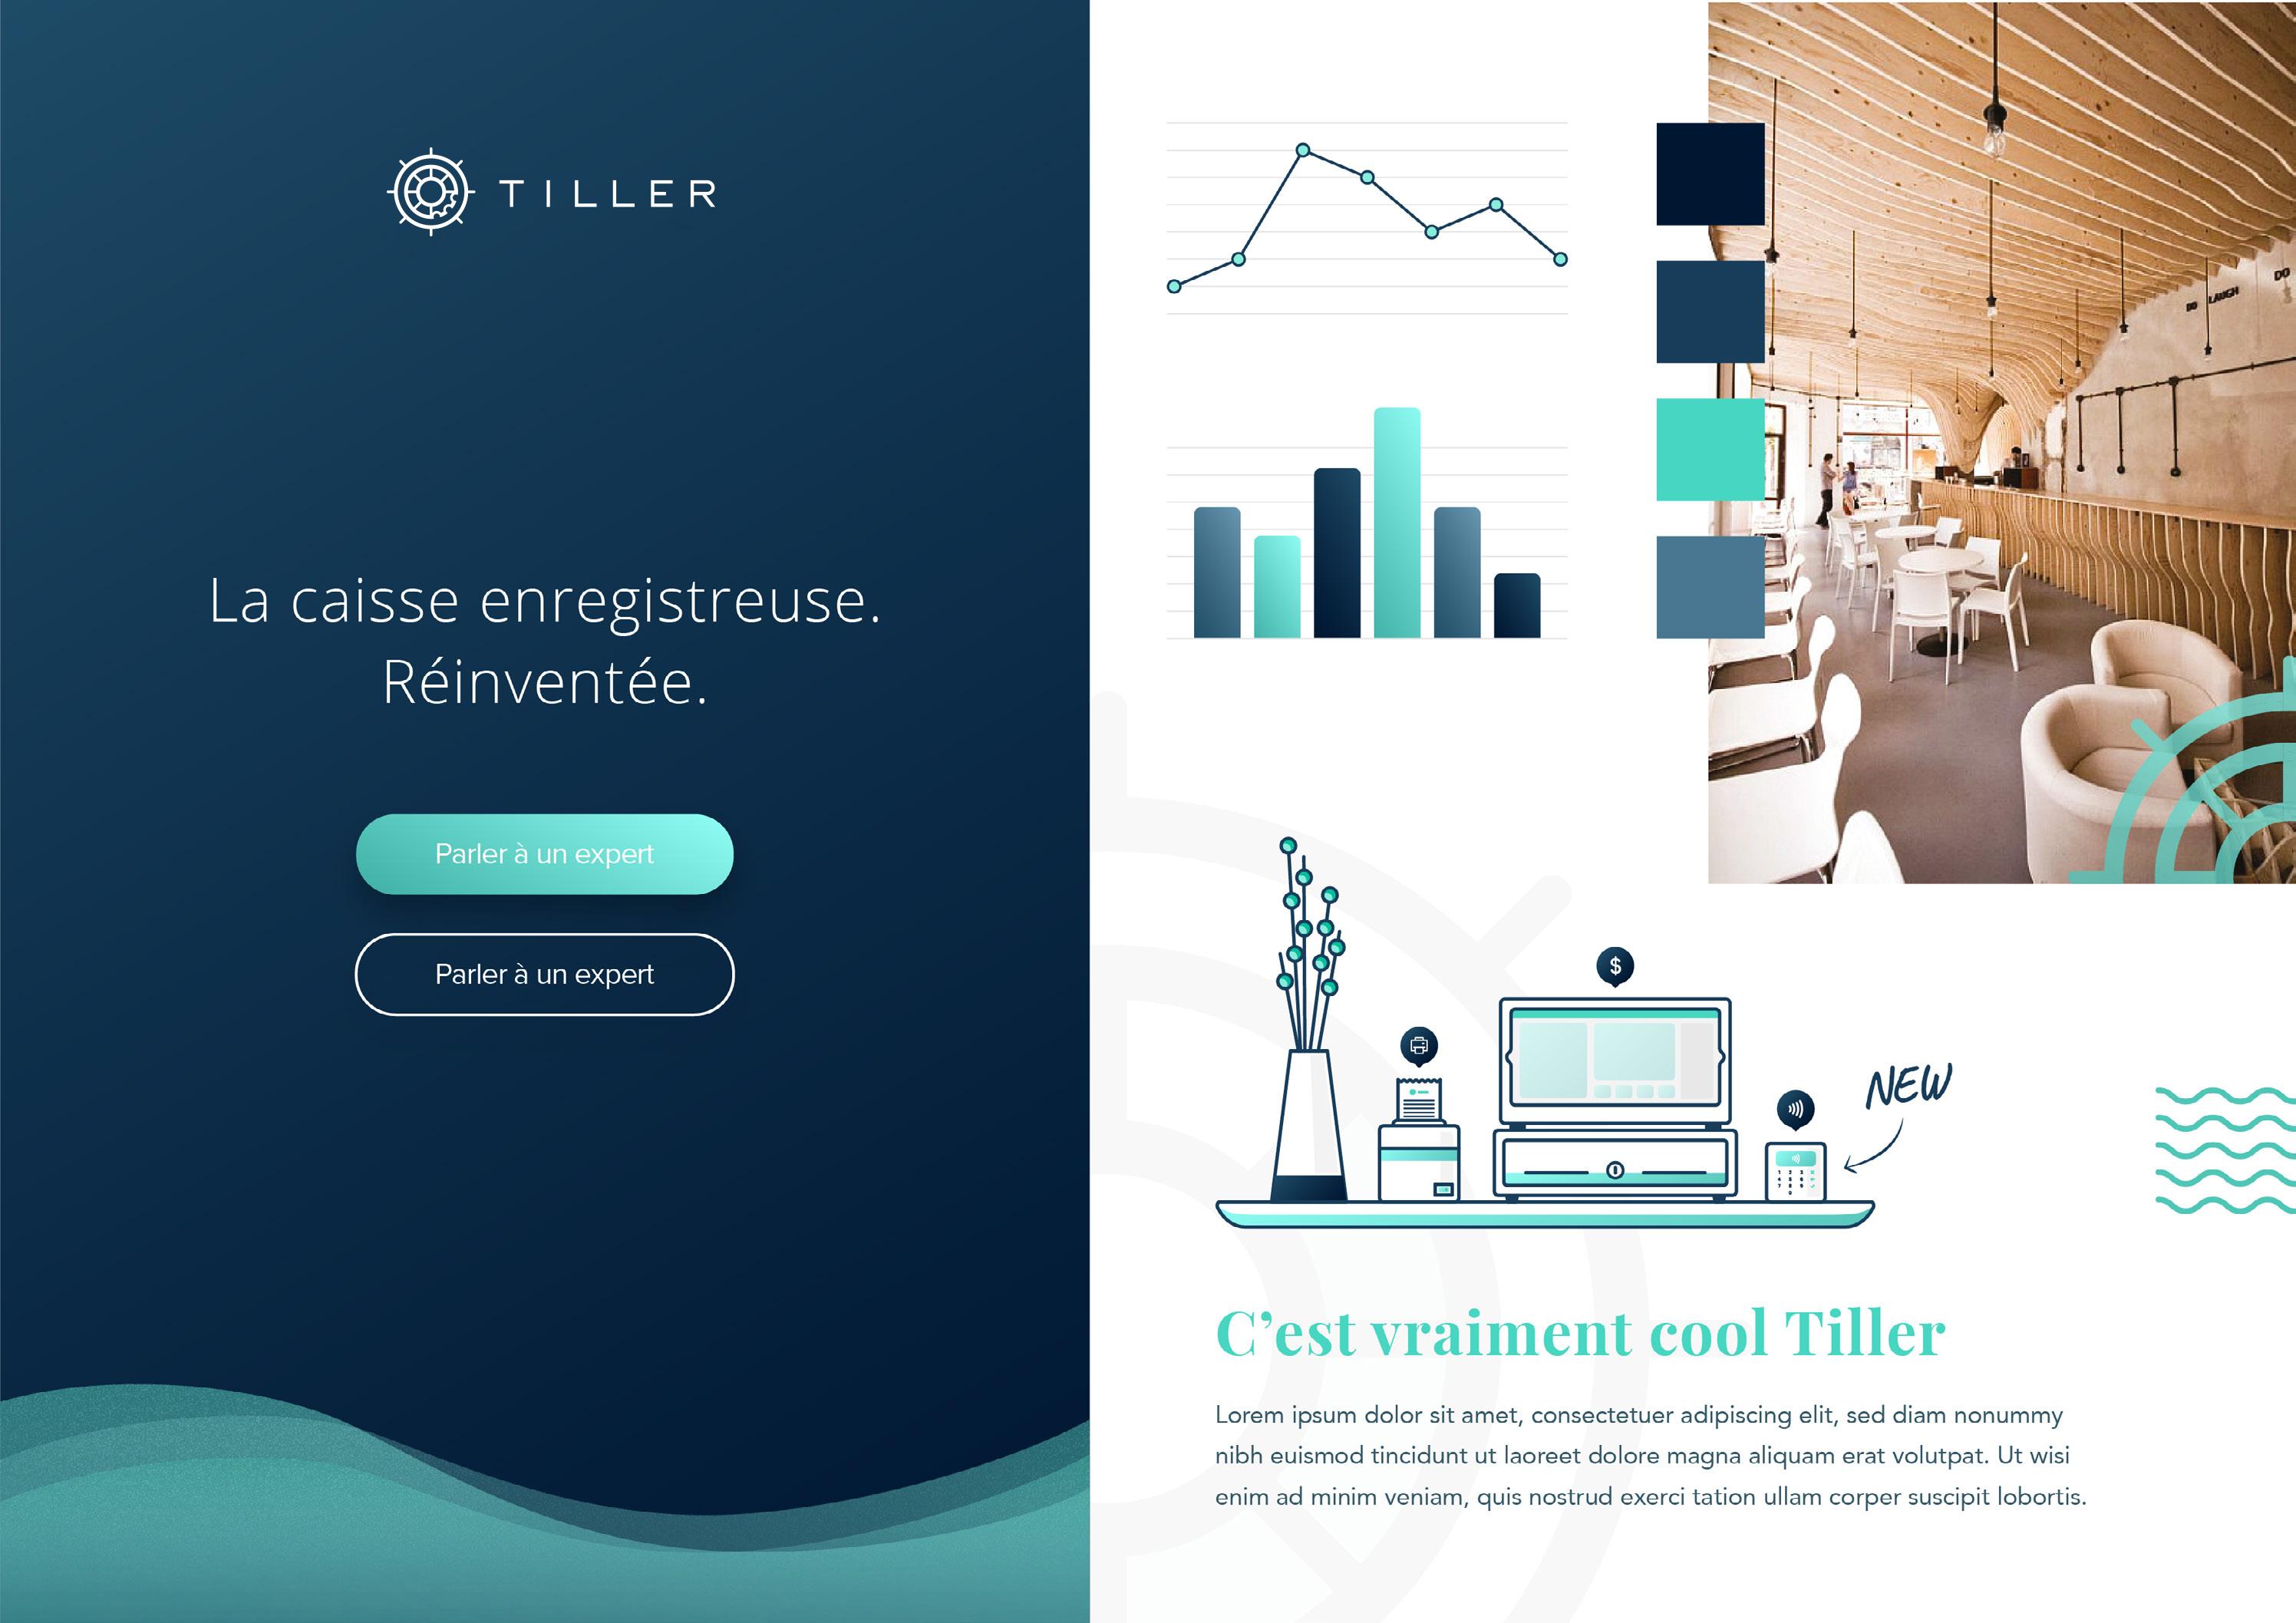 Yellowlab_Tiller_Planche-Graphique